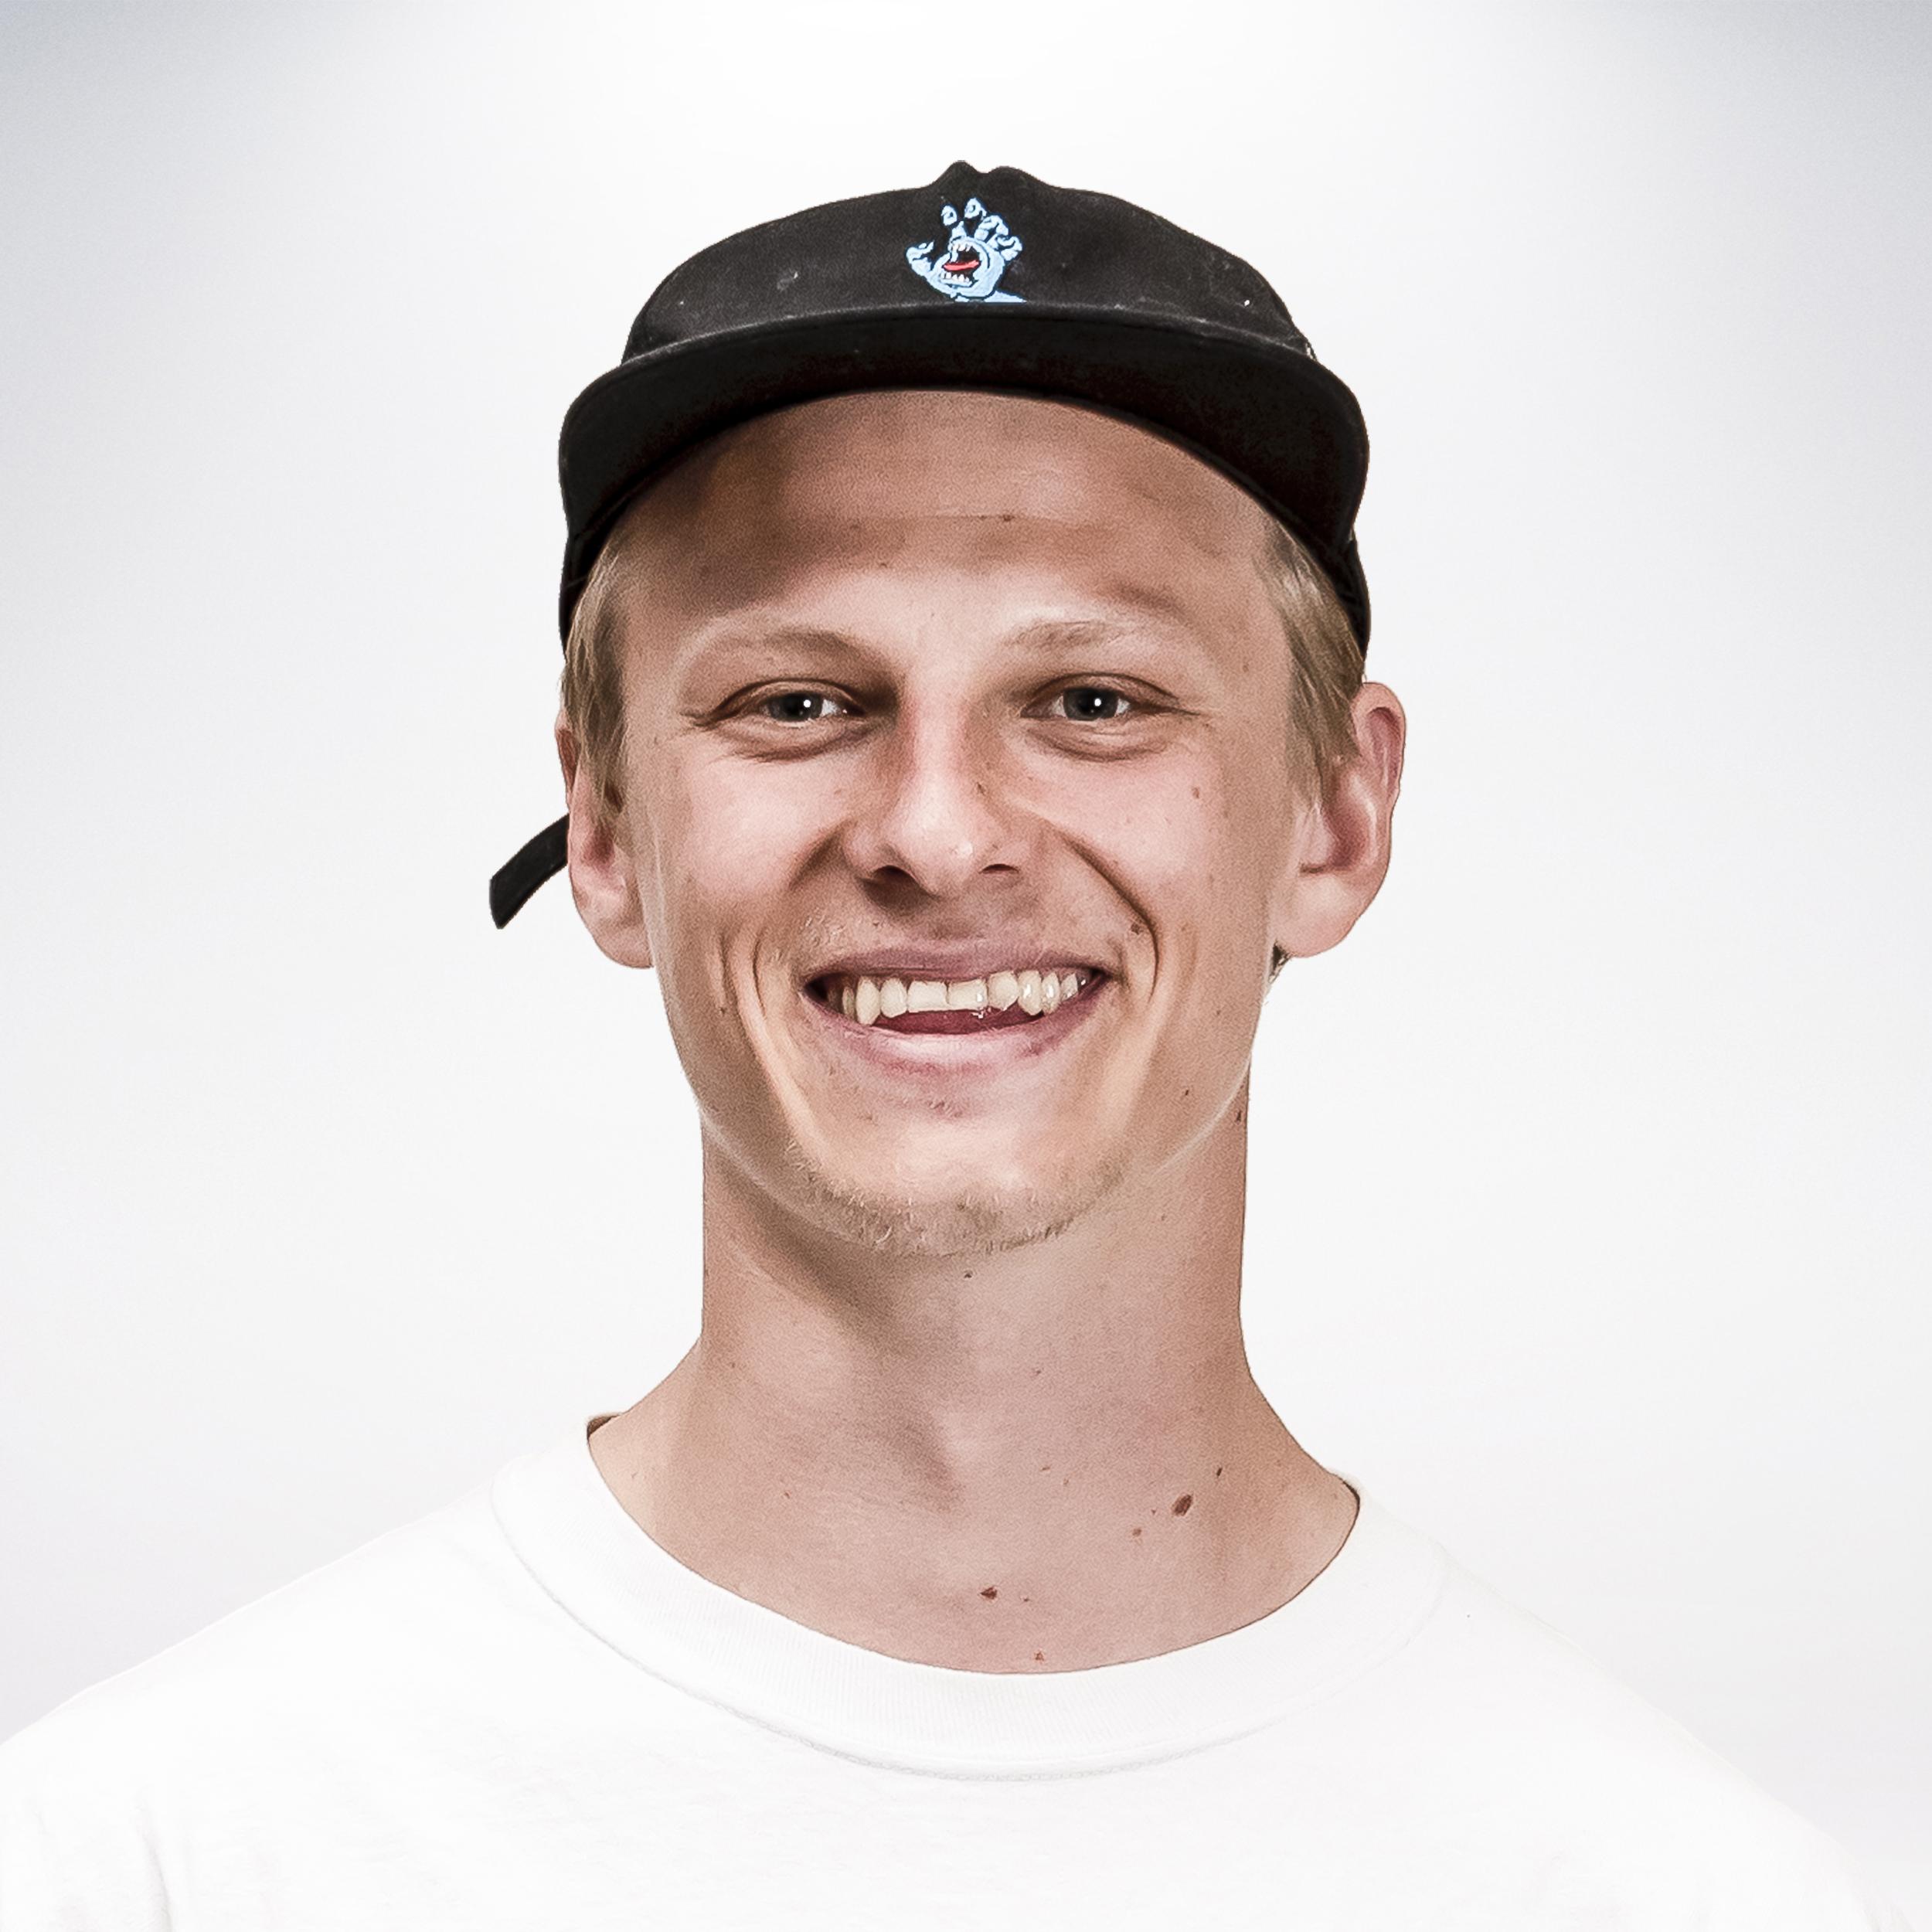 ONNI SALTEVO   26, Helsinki, @saltevonni  Sponsors :  Santa Cruz Skateboards, Bones, New Balance, Beyond